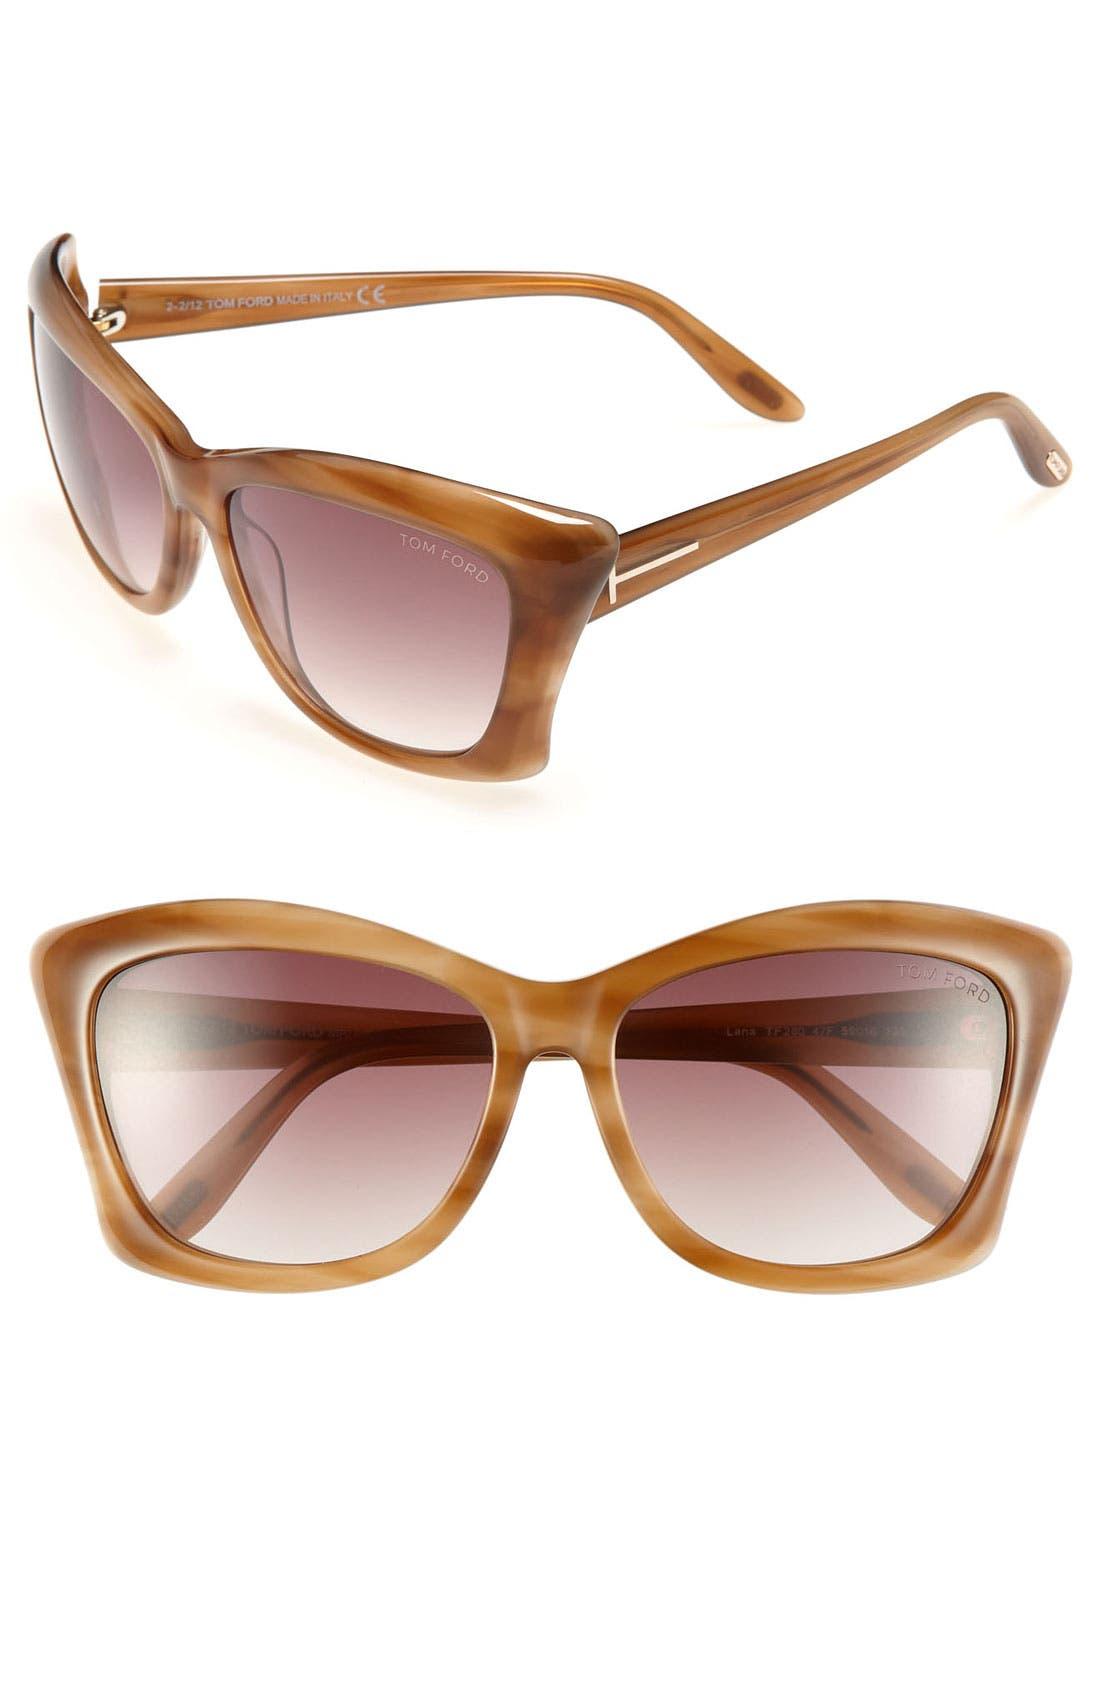 Alternate Image 1 Selected - Tom Ford 'Lana' 59mm Sunglasses